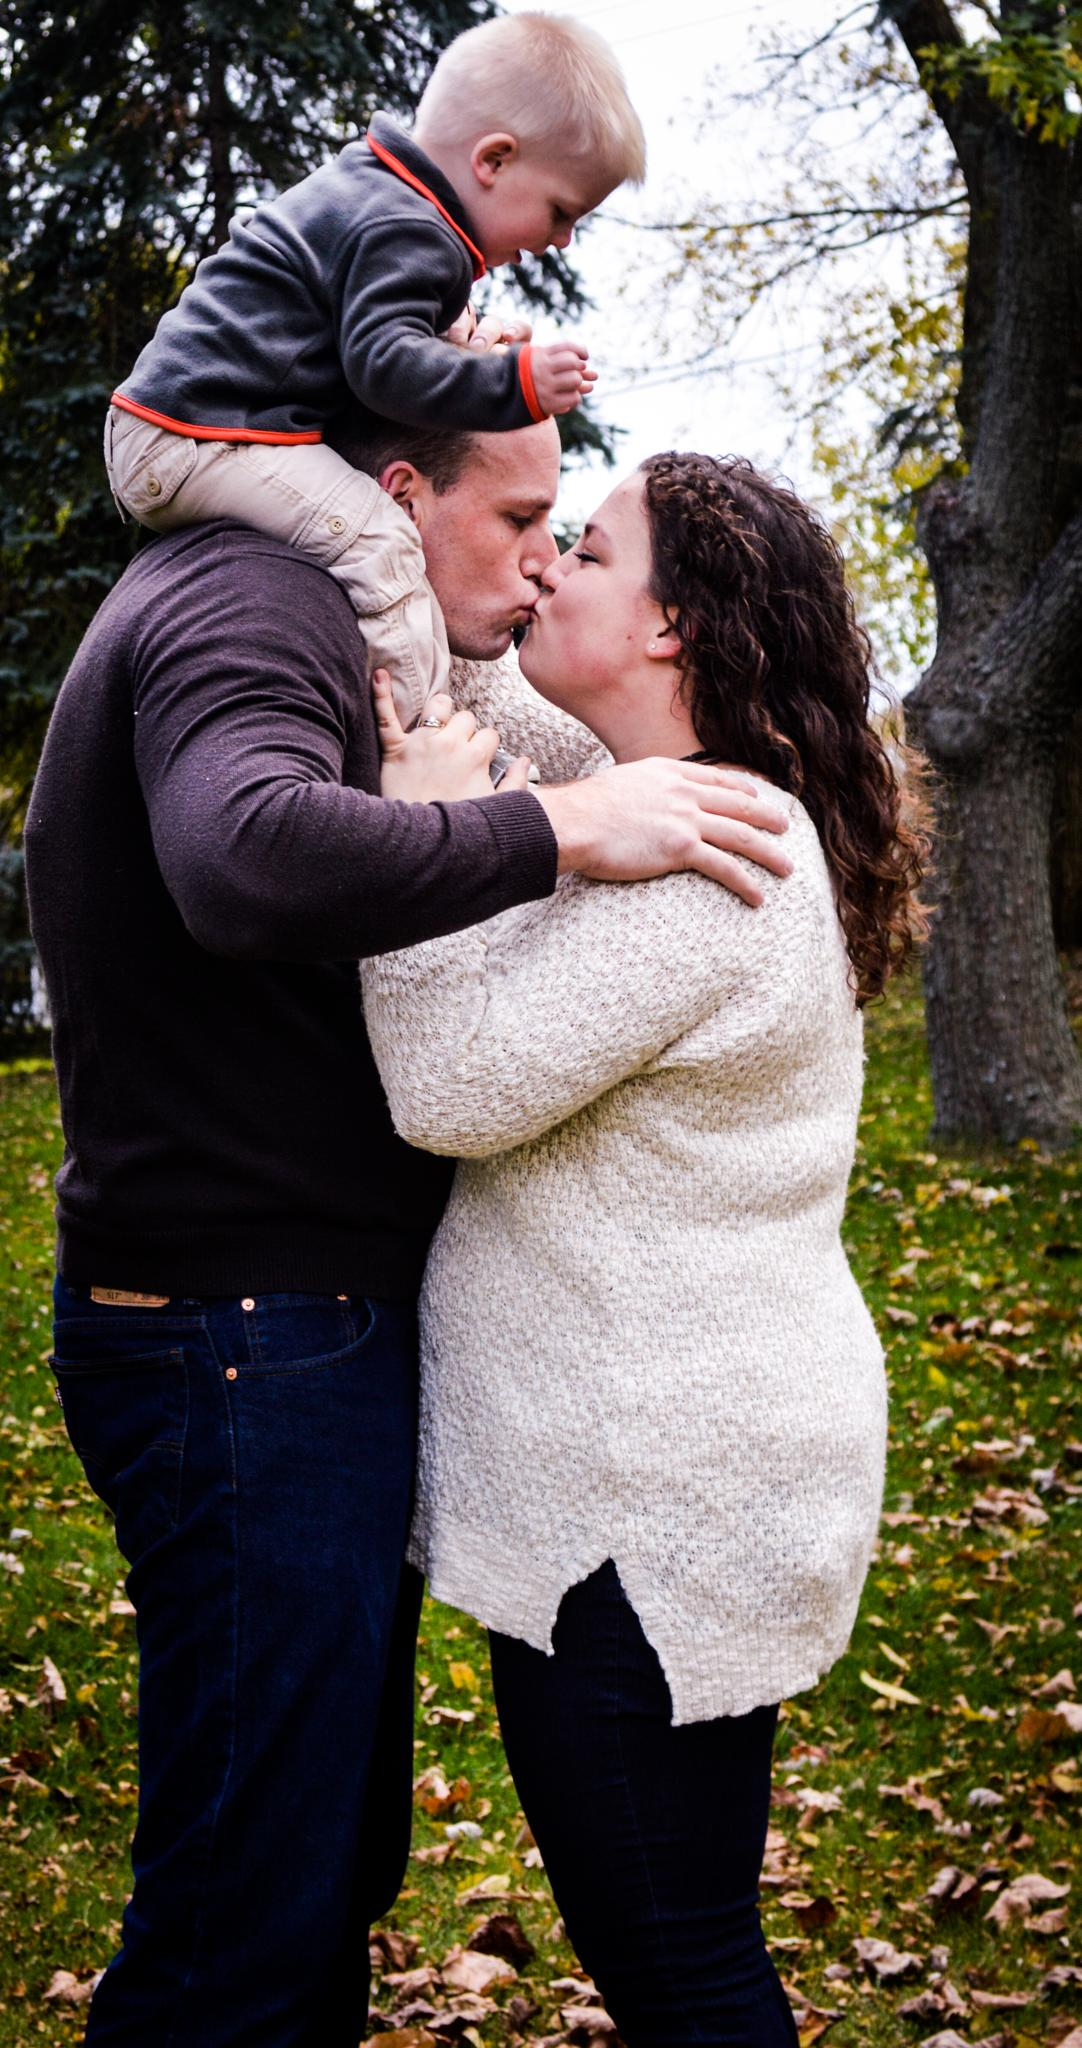 Family Love by courtney.doxzon